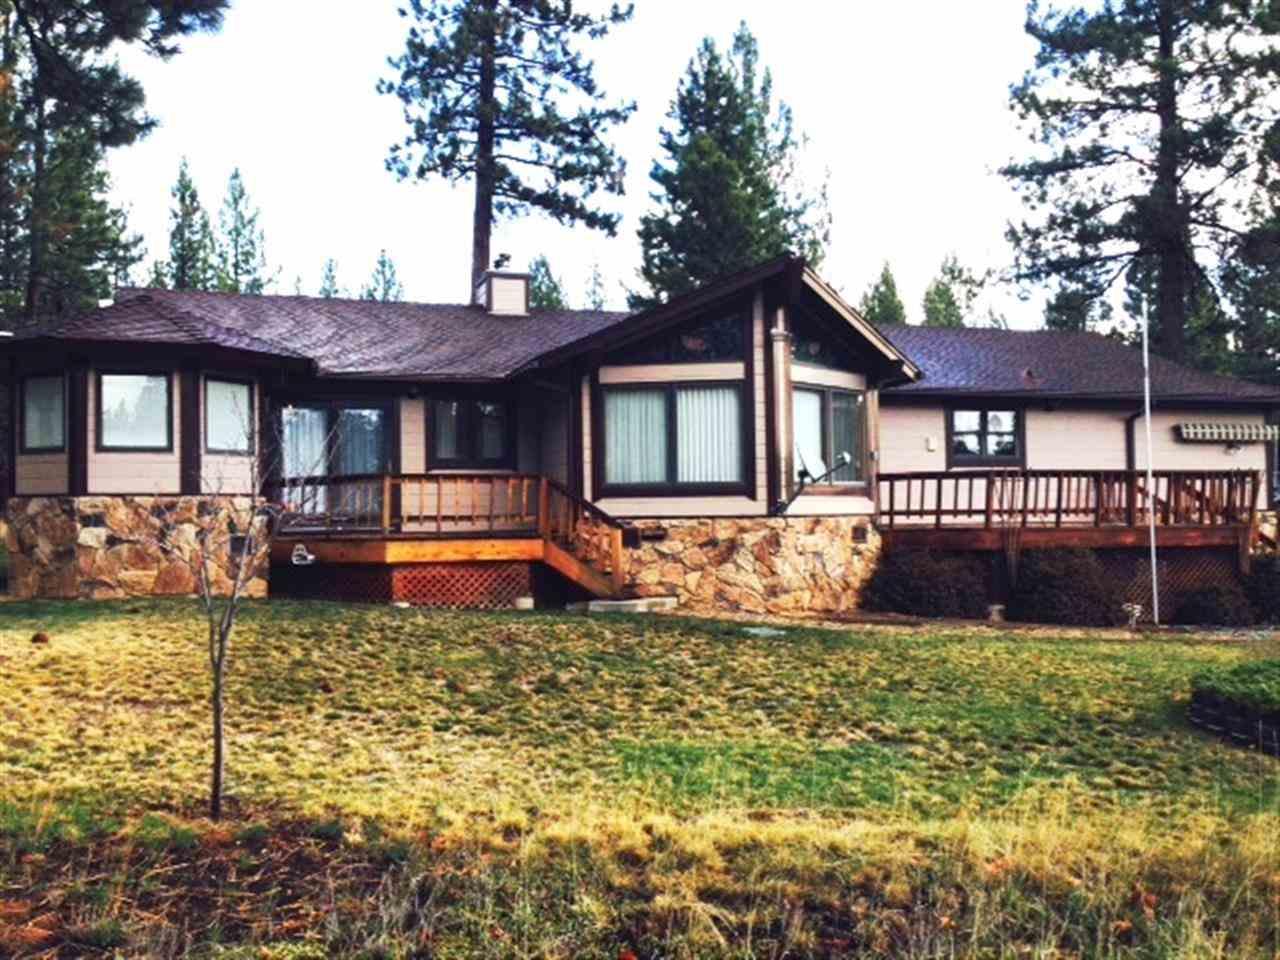 Single Family Home for Active at 955 Manzanita Street 955 Manzanita Street Portola, California 96122 United States